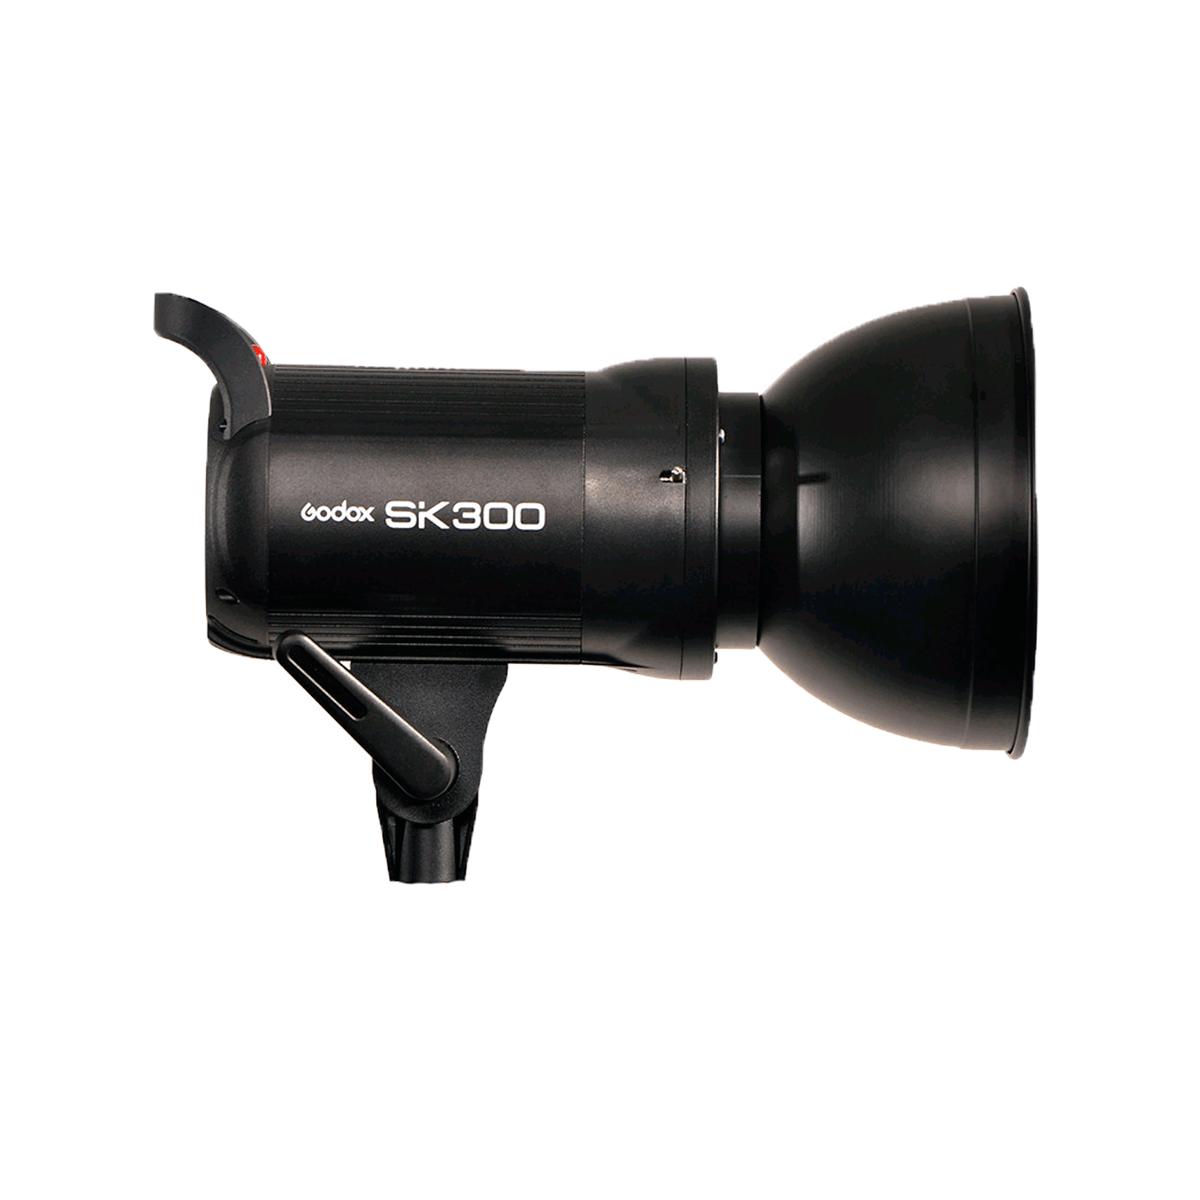 Flash Tocha 300W Godox SK300 Greika para Estúdio Fotográfico  - Fotolux